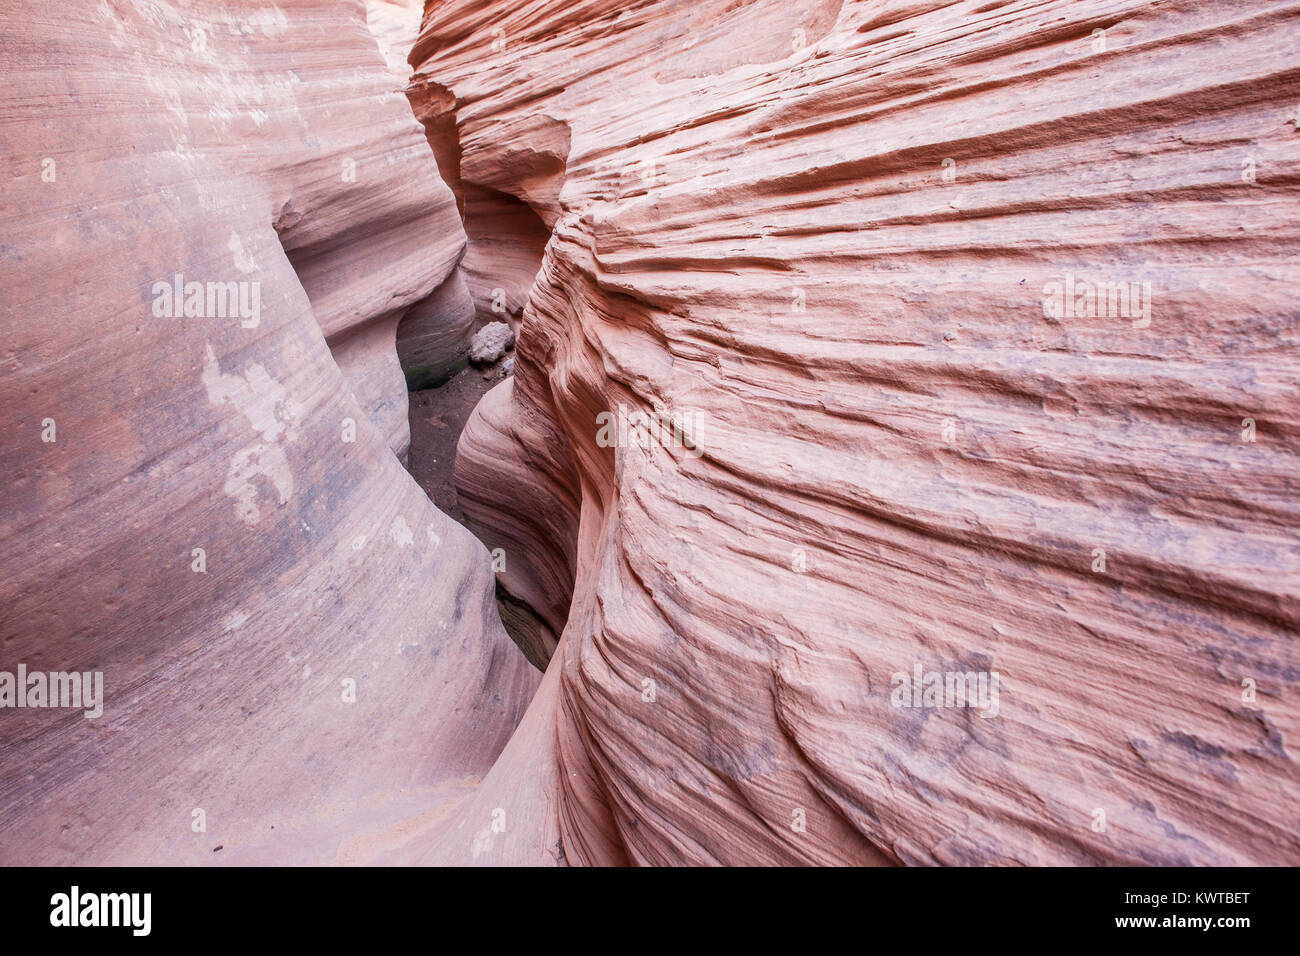 Peekaboo Canyon, a slot canyon in Grand Staircase-Escalante National Monument, Utah, USA. Stock Photo